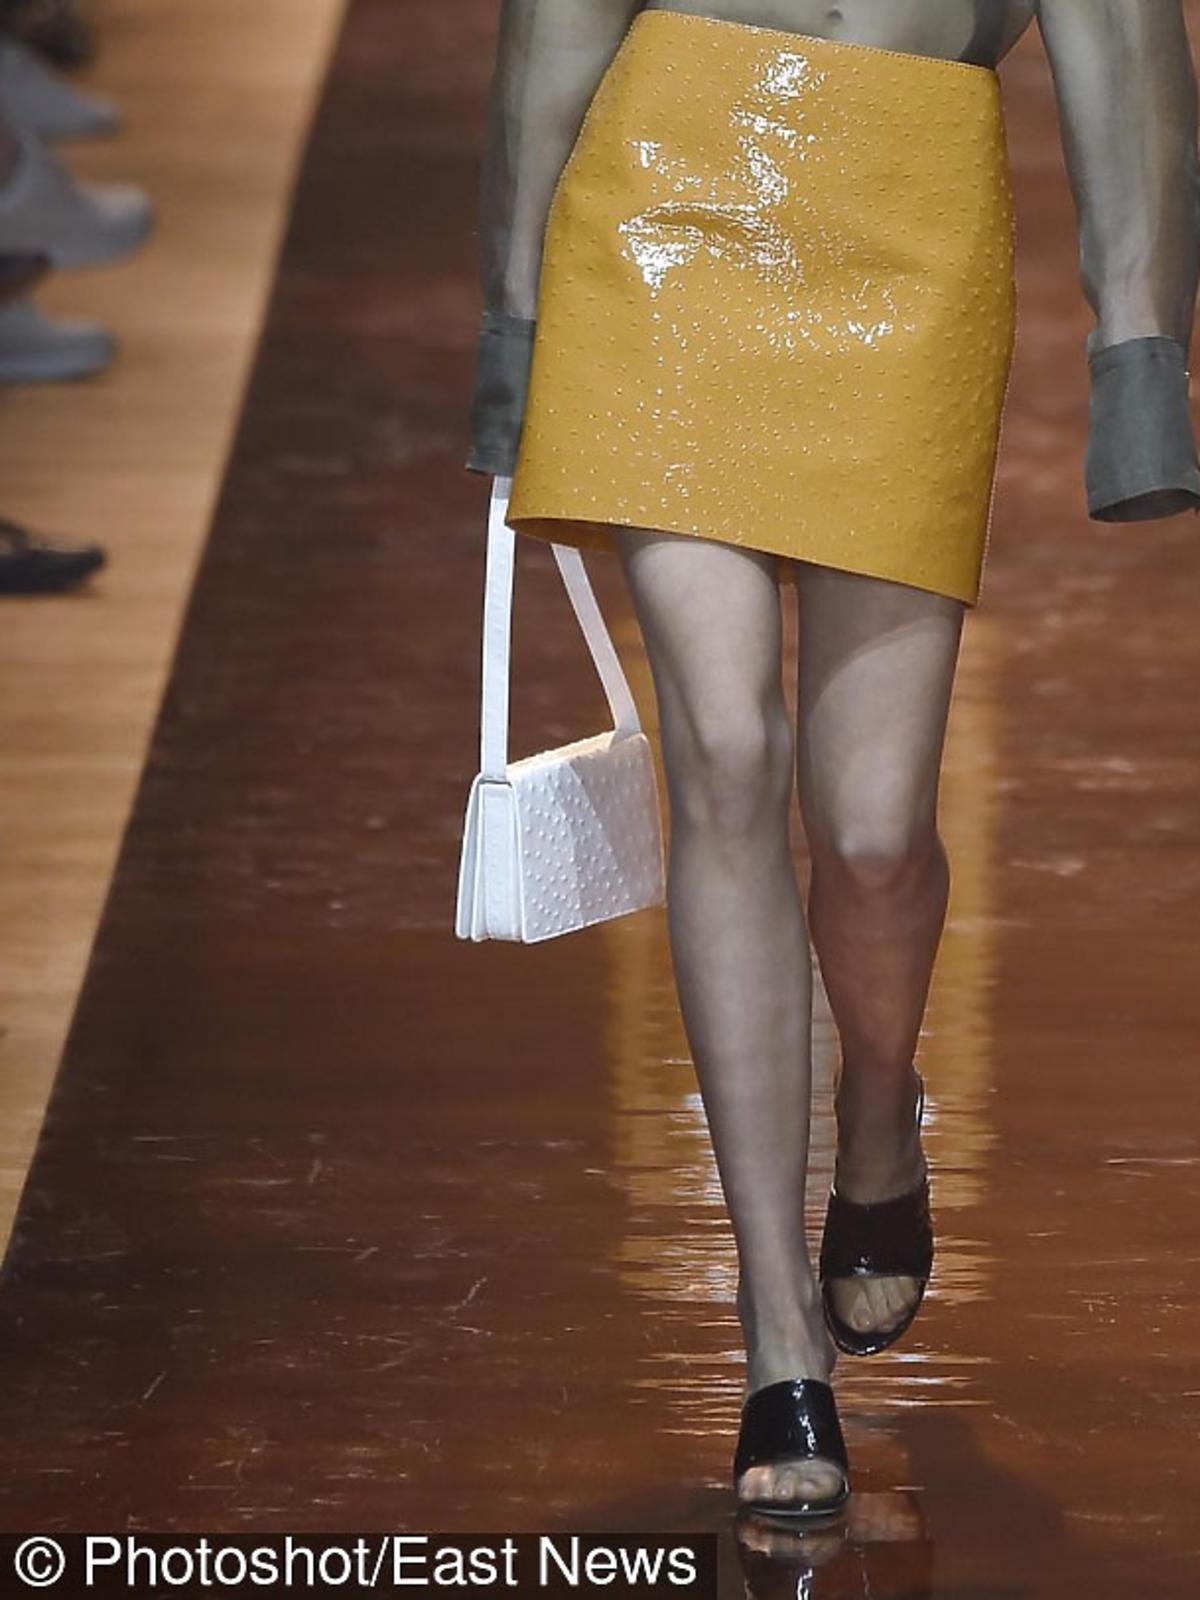 Biała torba na pokazie Miu Miu